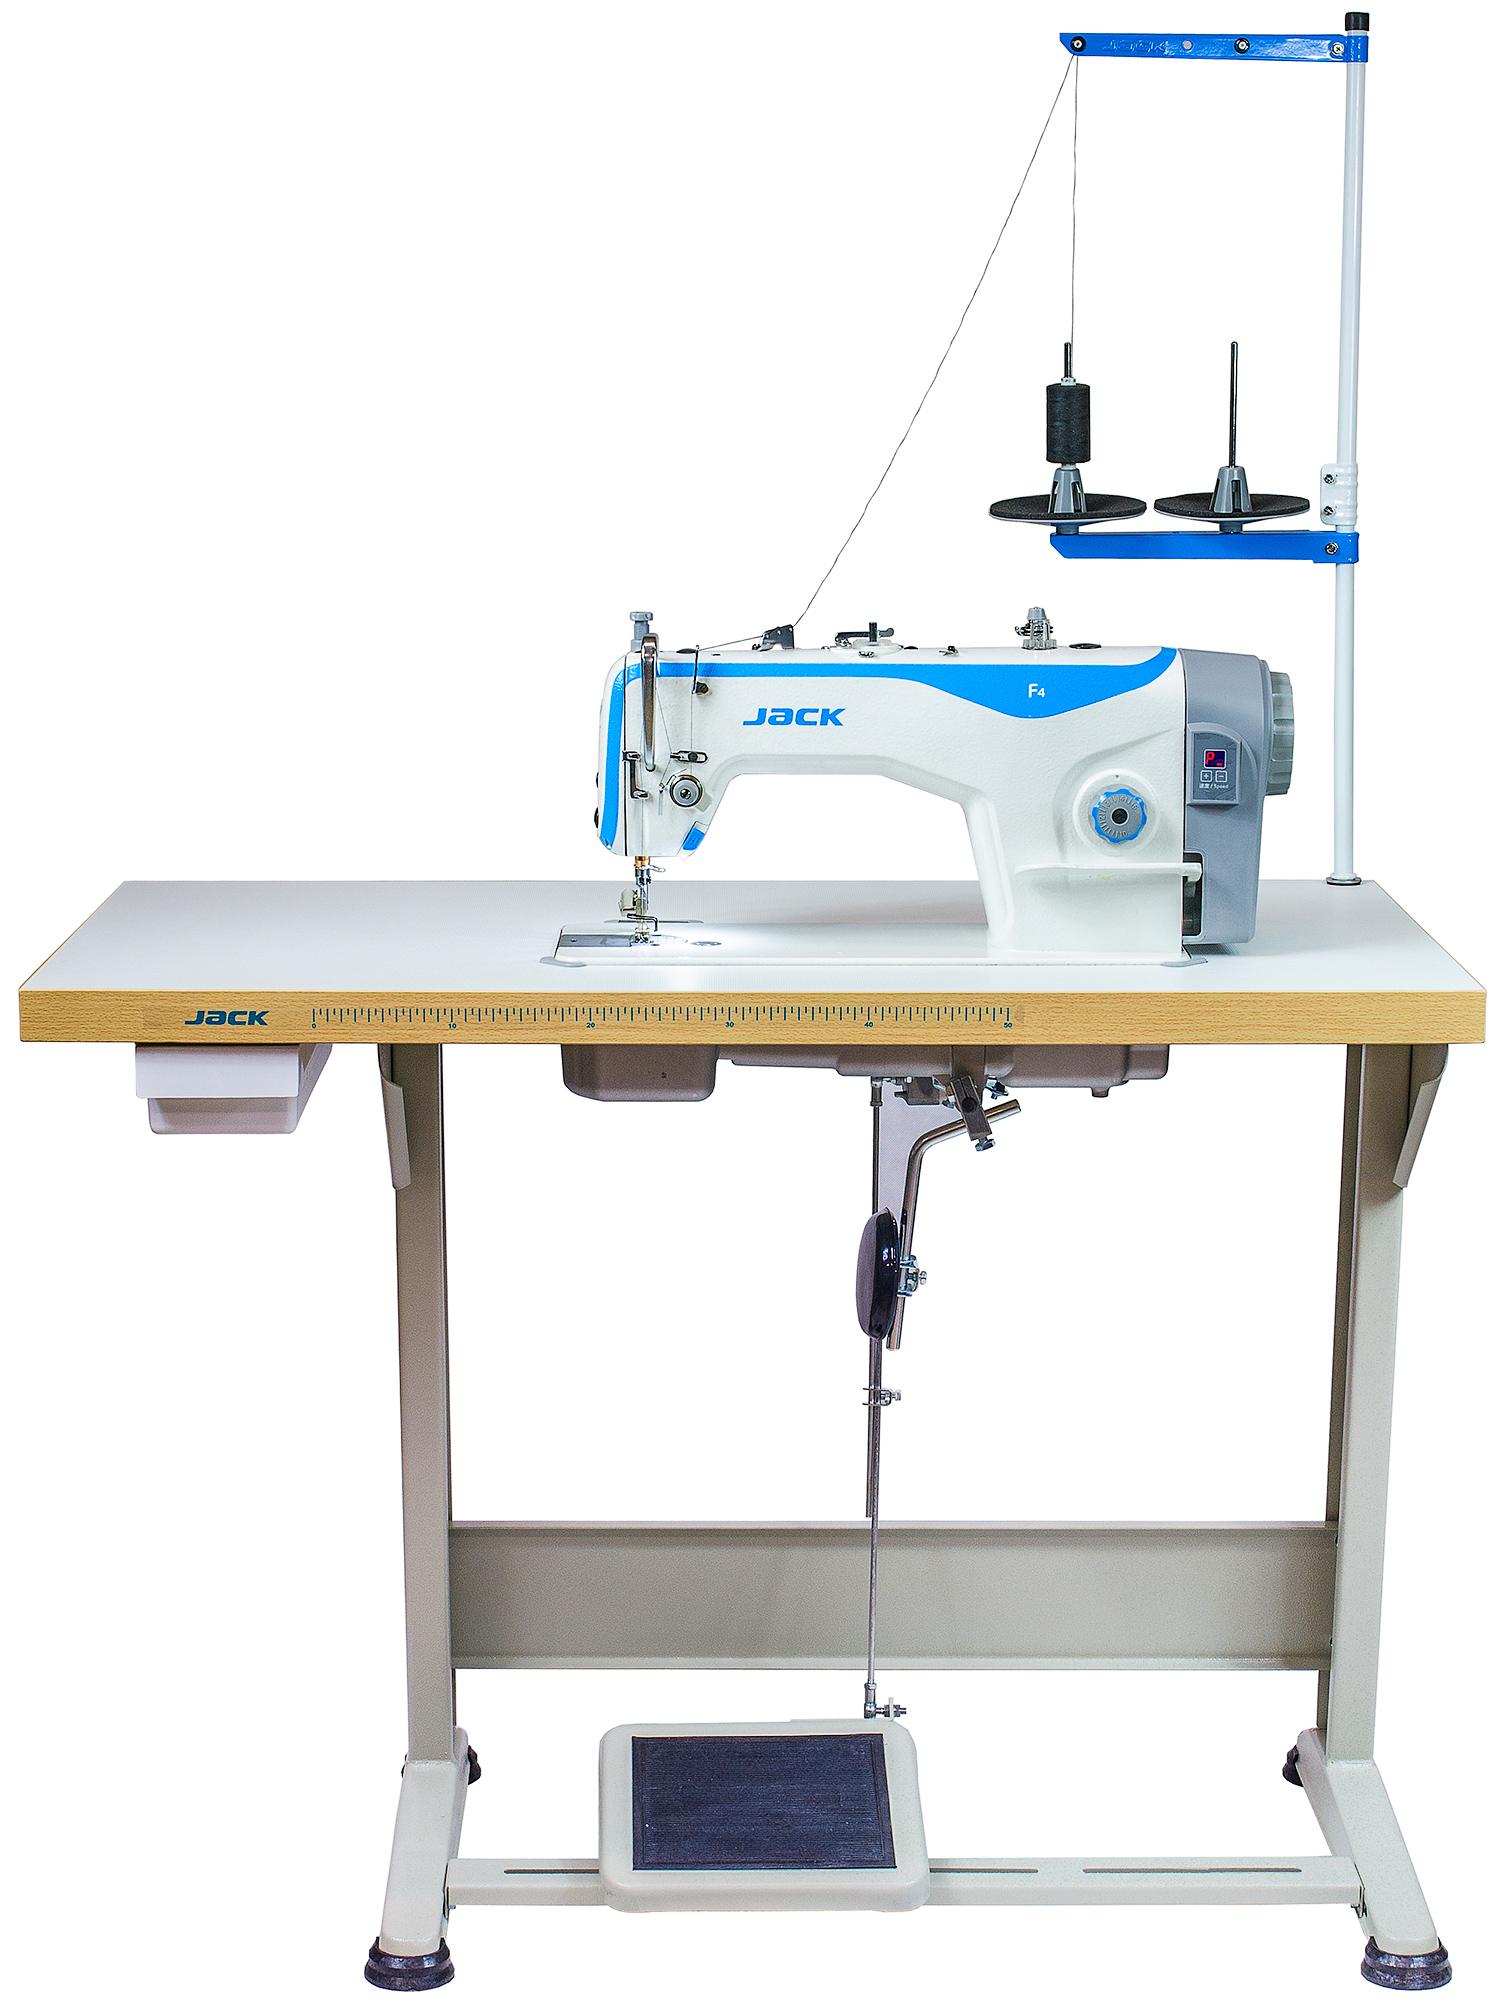 Jack F4 – kpl. výkonný šijací stroj so zúbkovým podávaním a servomotorom v hlave